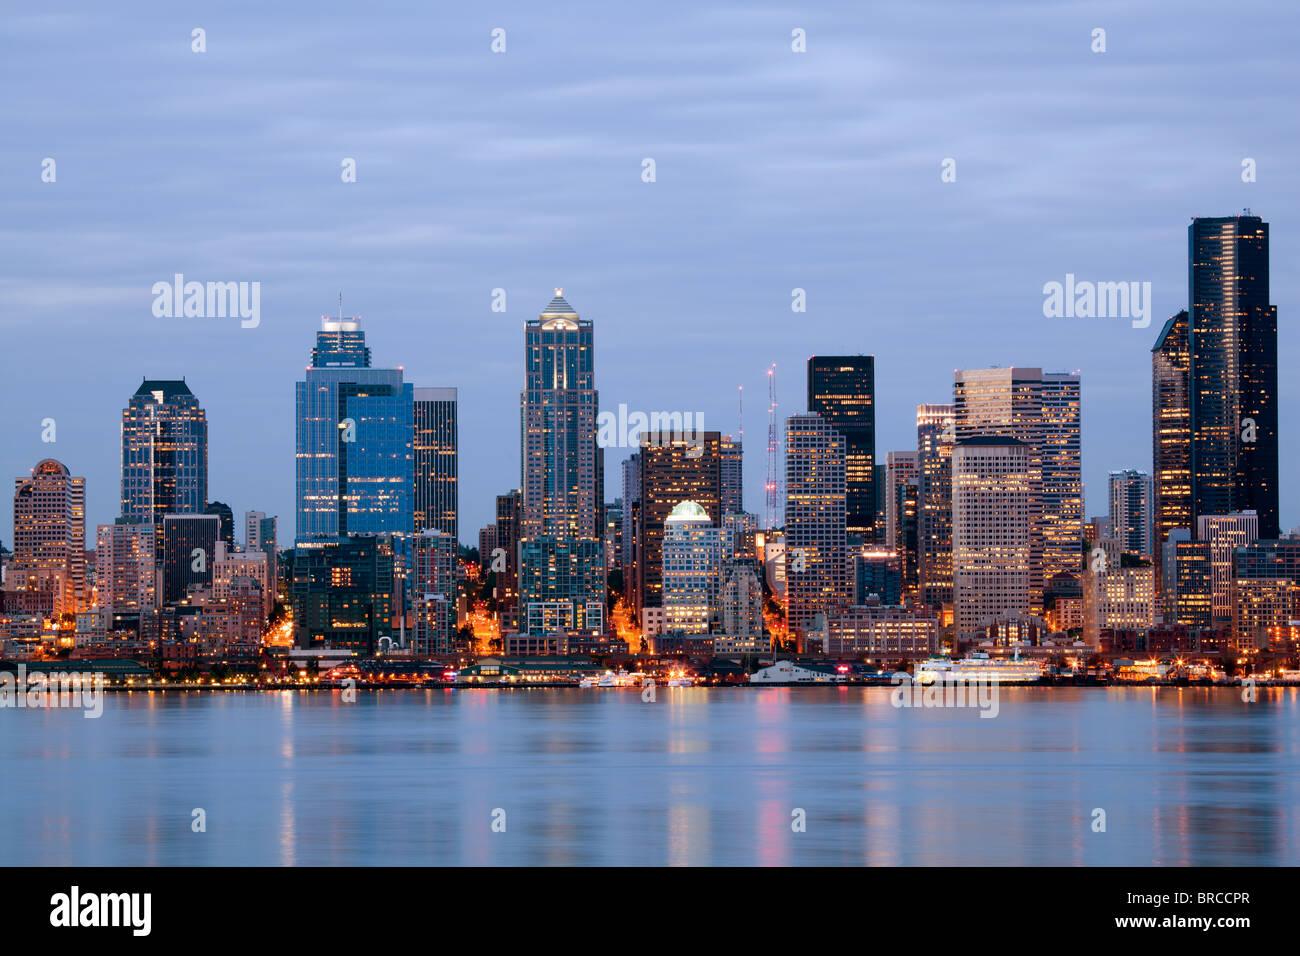 Seattle skyline - Washington USA. Buildings along waterfront at twilight. - Stock Image